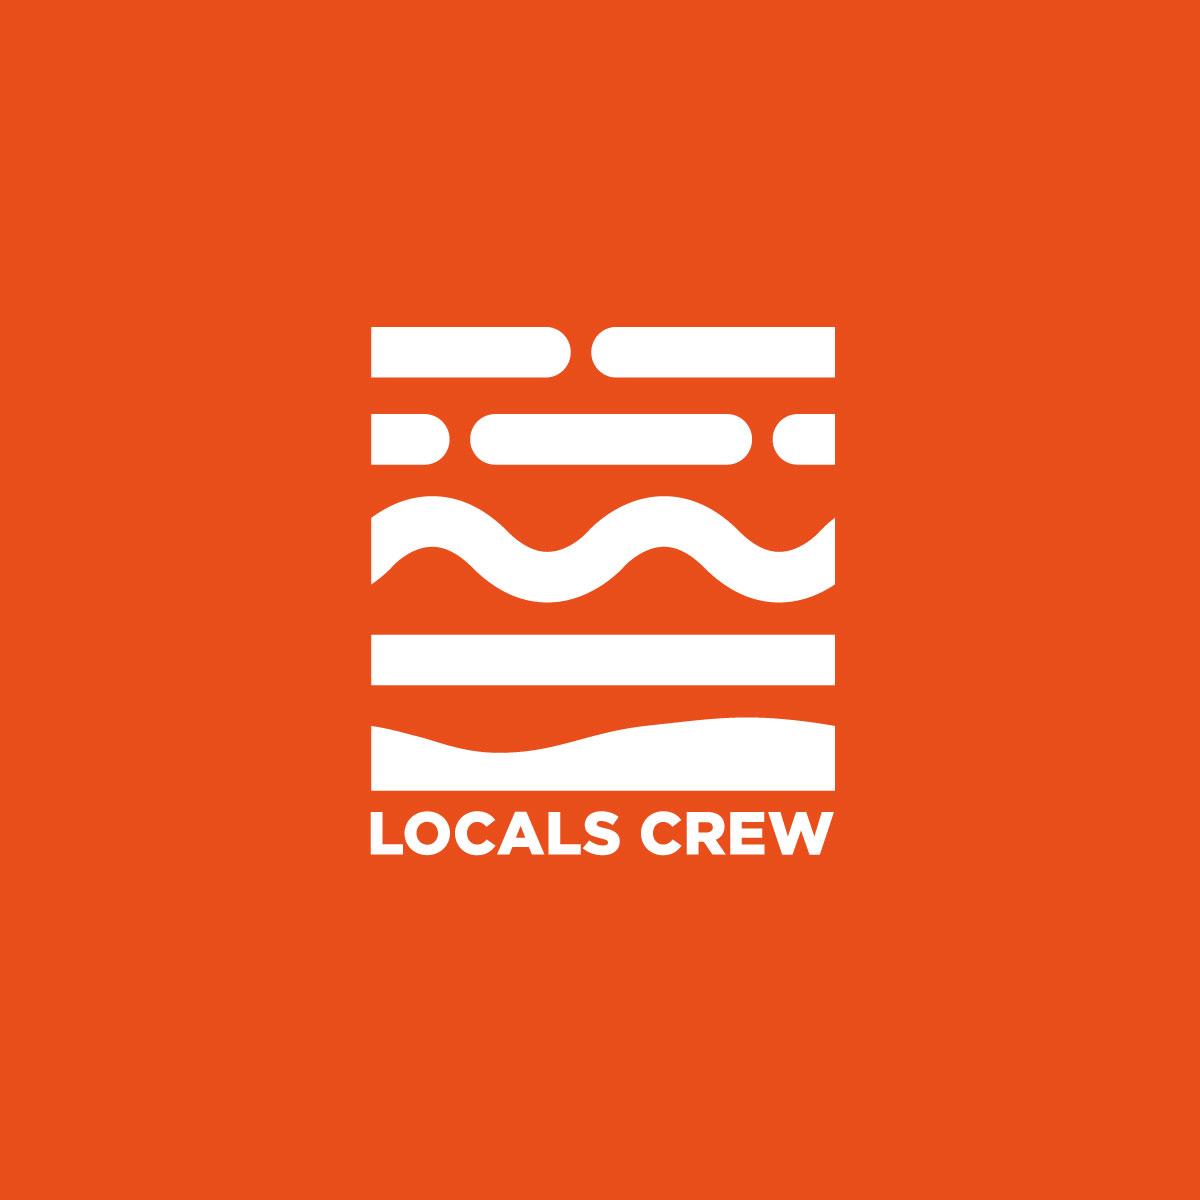 https://www.orlandinifrancesco.com/wp/wp-content/uploads/2019/02/Local-Crew-Salento-Logo-02.jpg